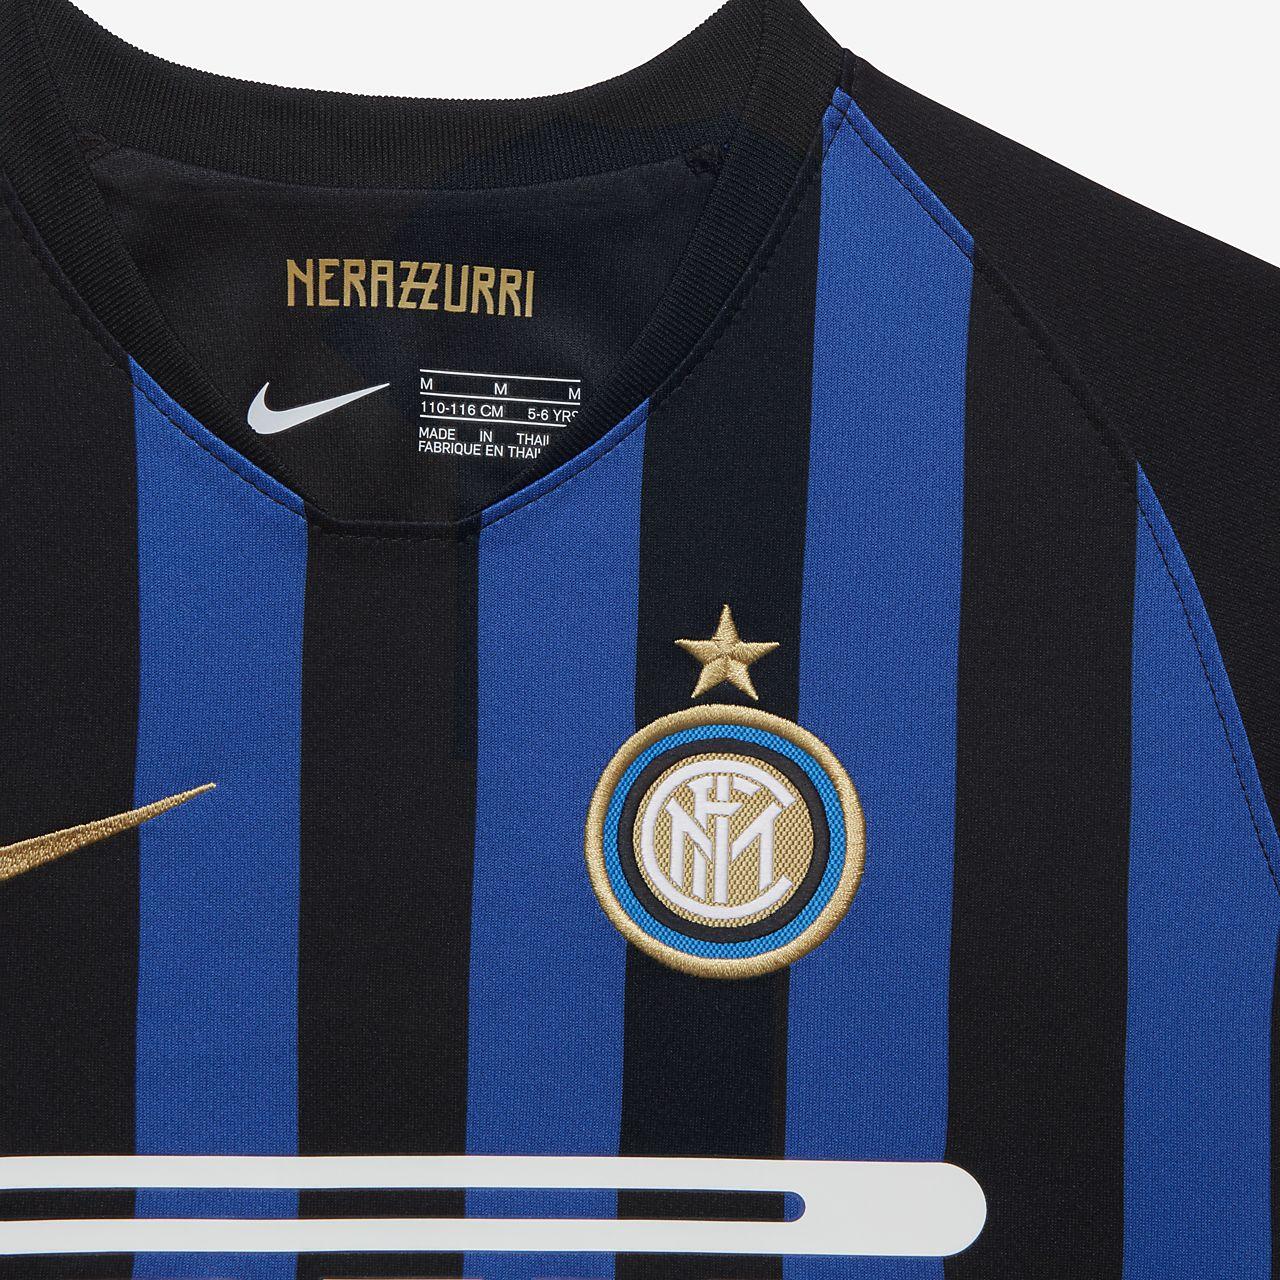 af9d537f7f00 2018 19 Inter Milan Stadium Home Younger Kids  Football Kit. Nike.com CA